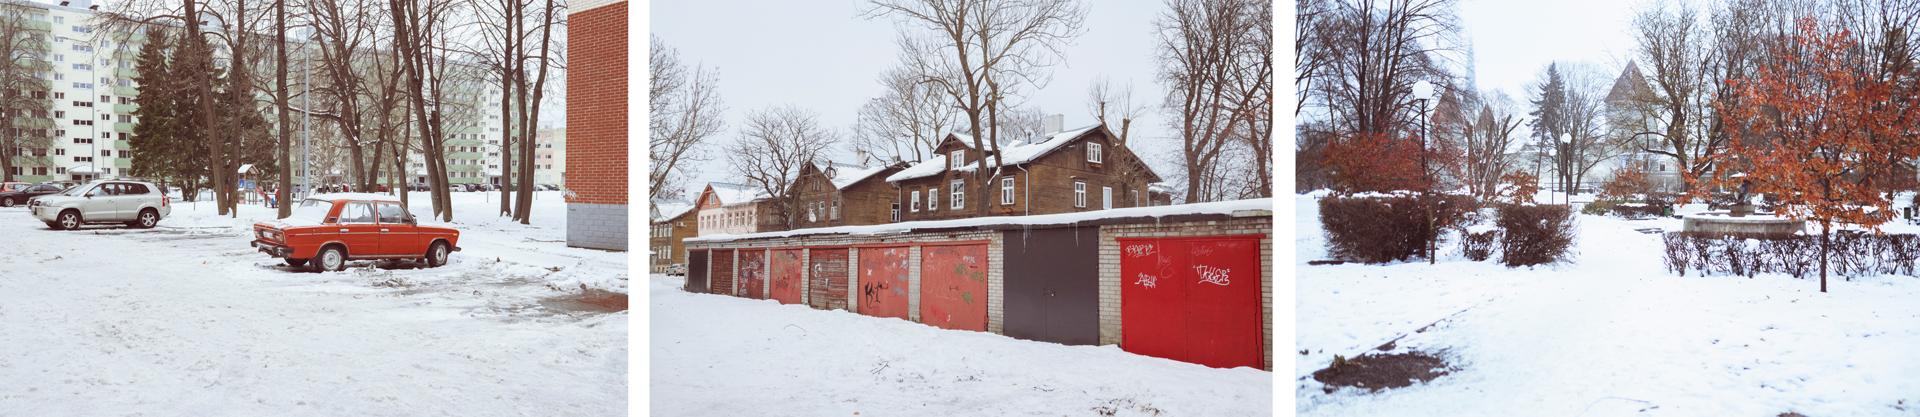 Mustamäe/Kalamaja/Casco antiguo de Tallin.